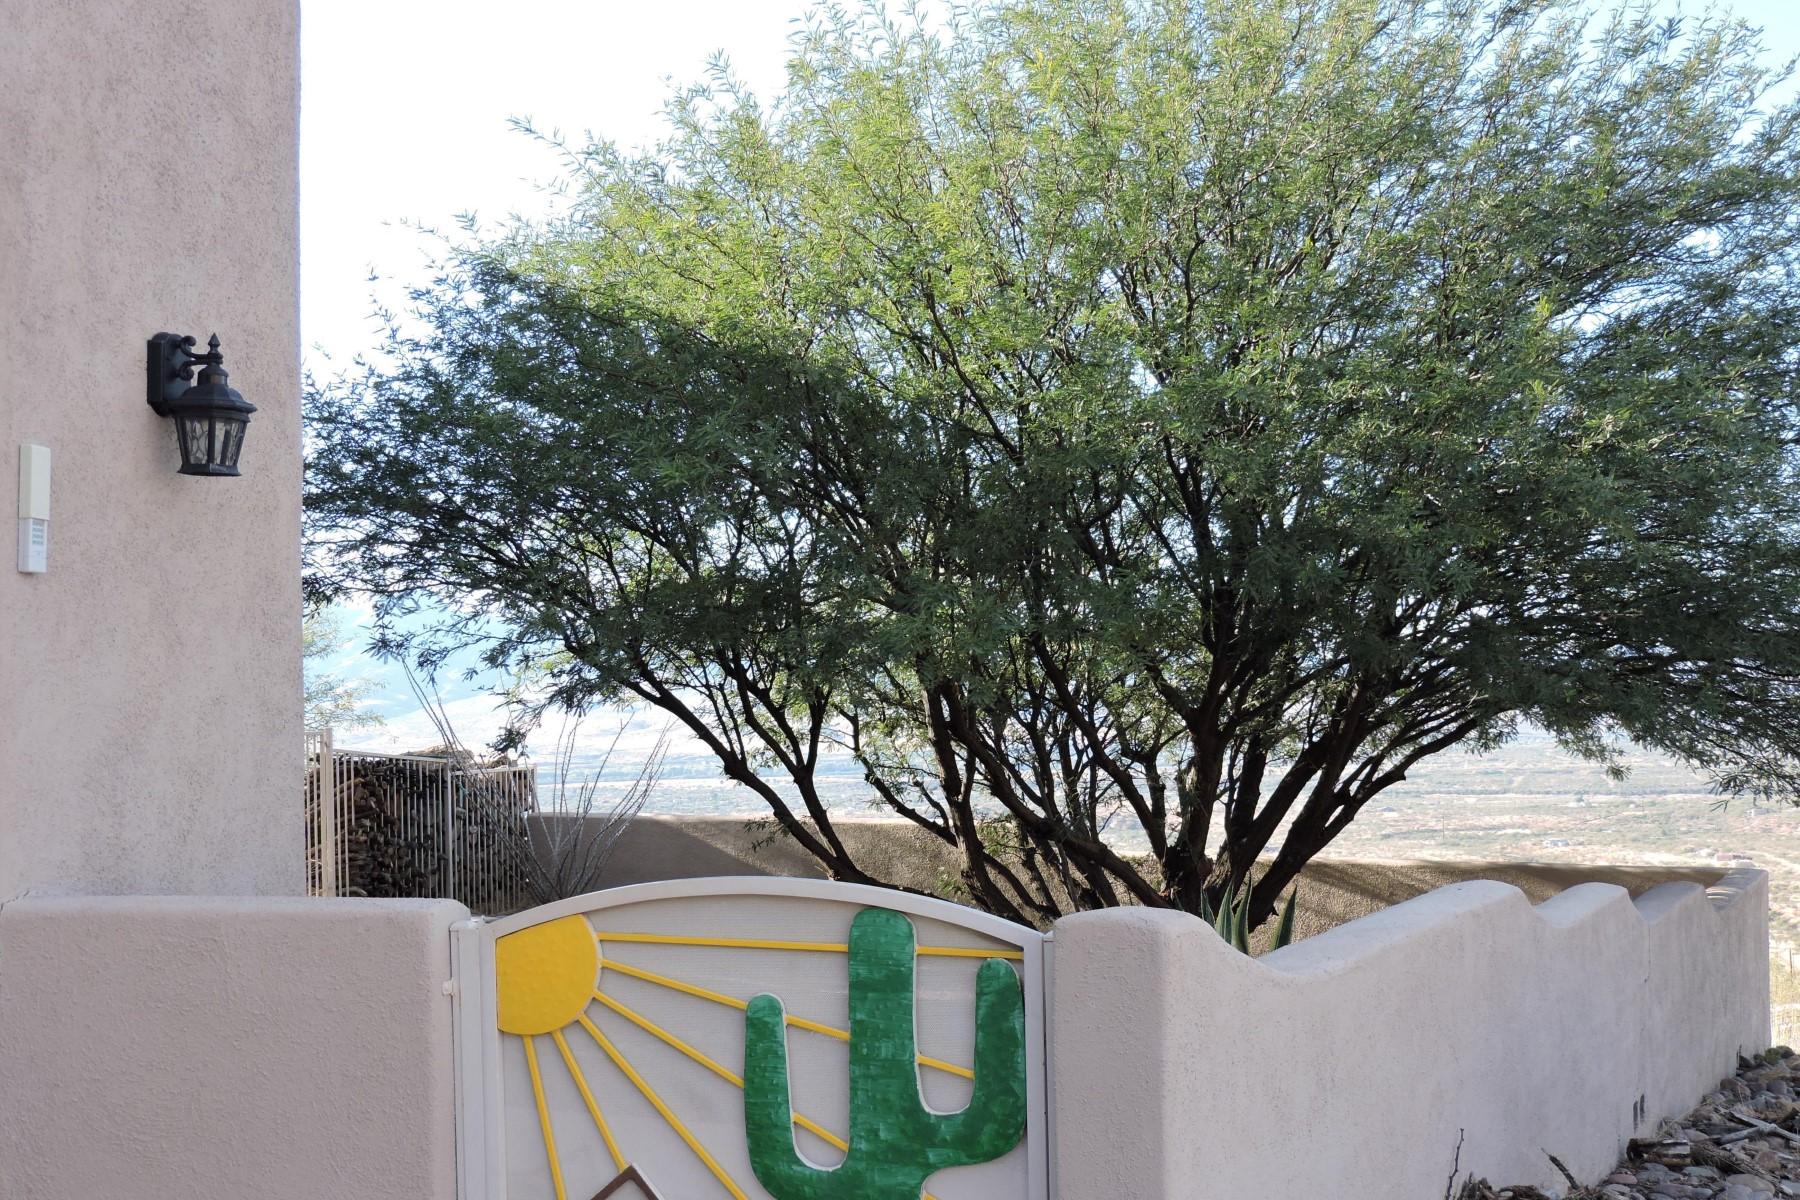 Single Family Home for Sale at Immaculate single story home in Rio Rico 1567 Camino Esturion Rio Rico, Arizona, 85648 United States